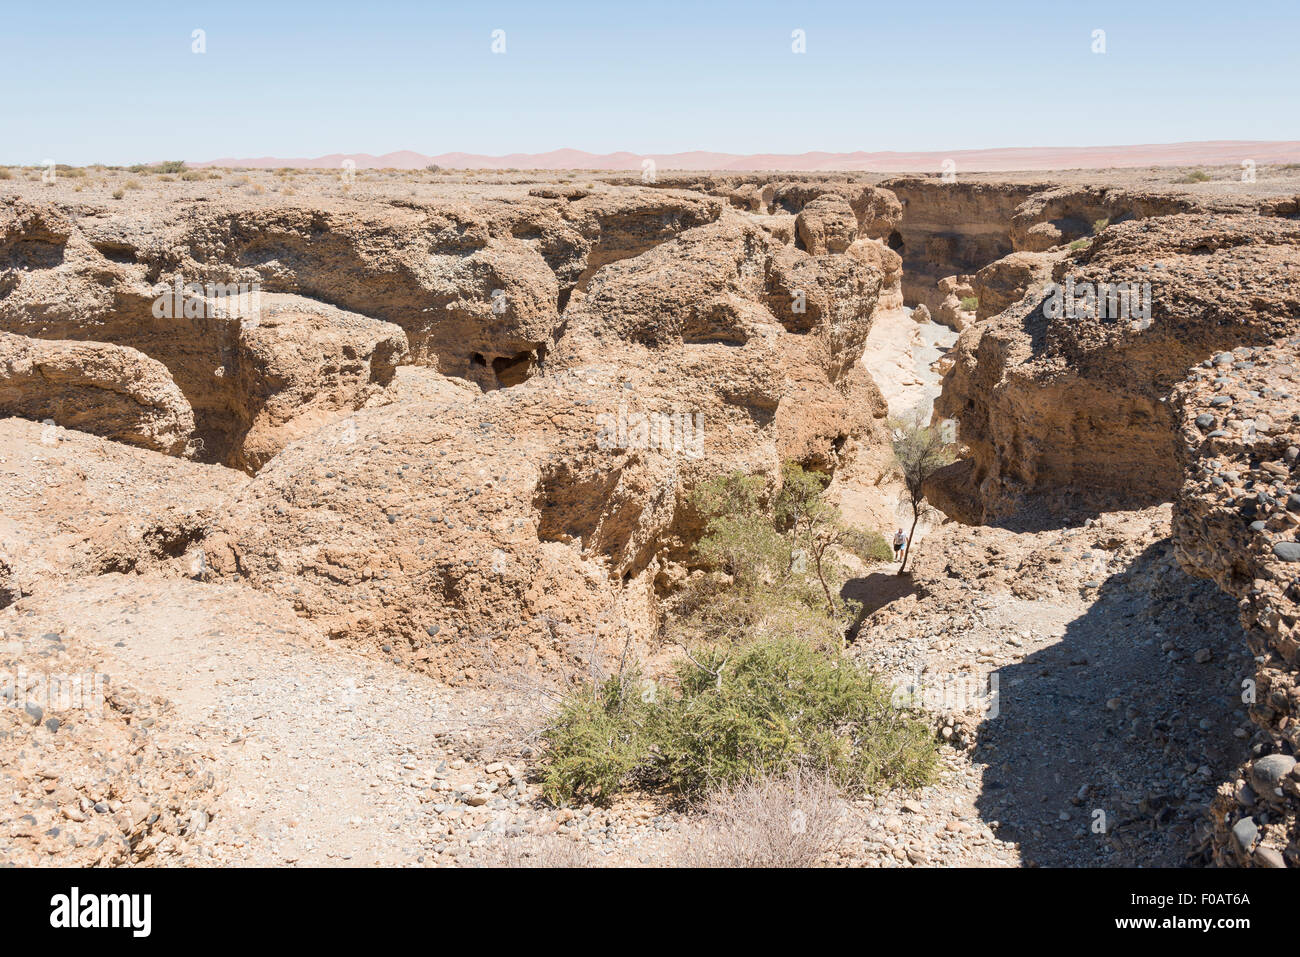 Sesriem Canyon, Namib-Naukluft National Park, Sossusviei, Namib Desert, Hardap Region, Republic of Namibia - Stock Image